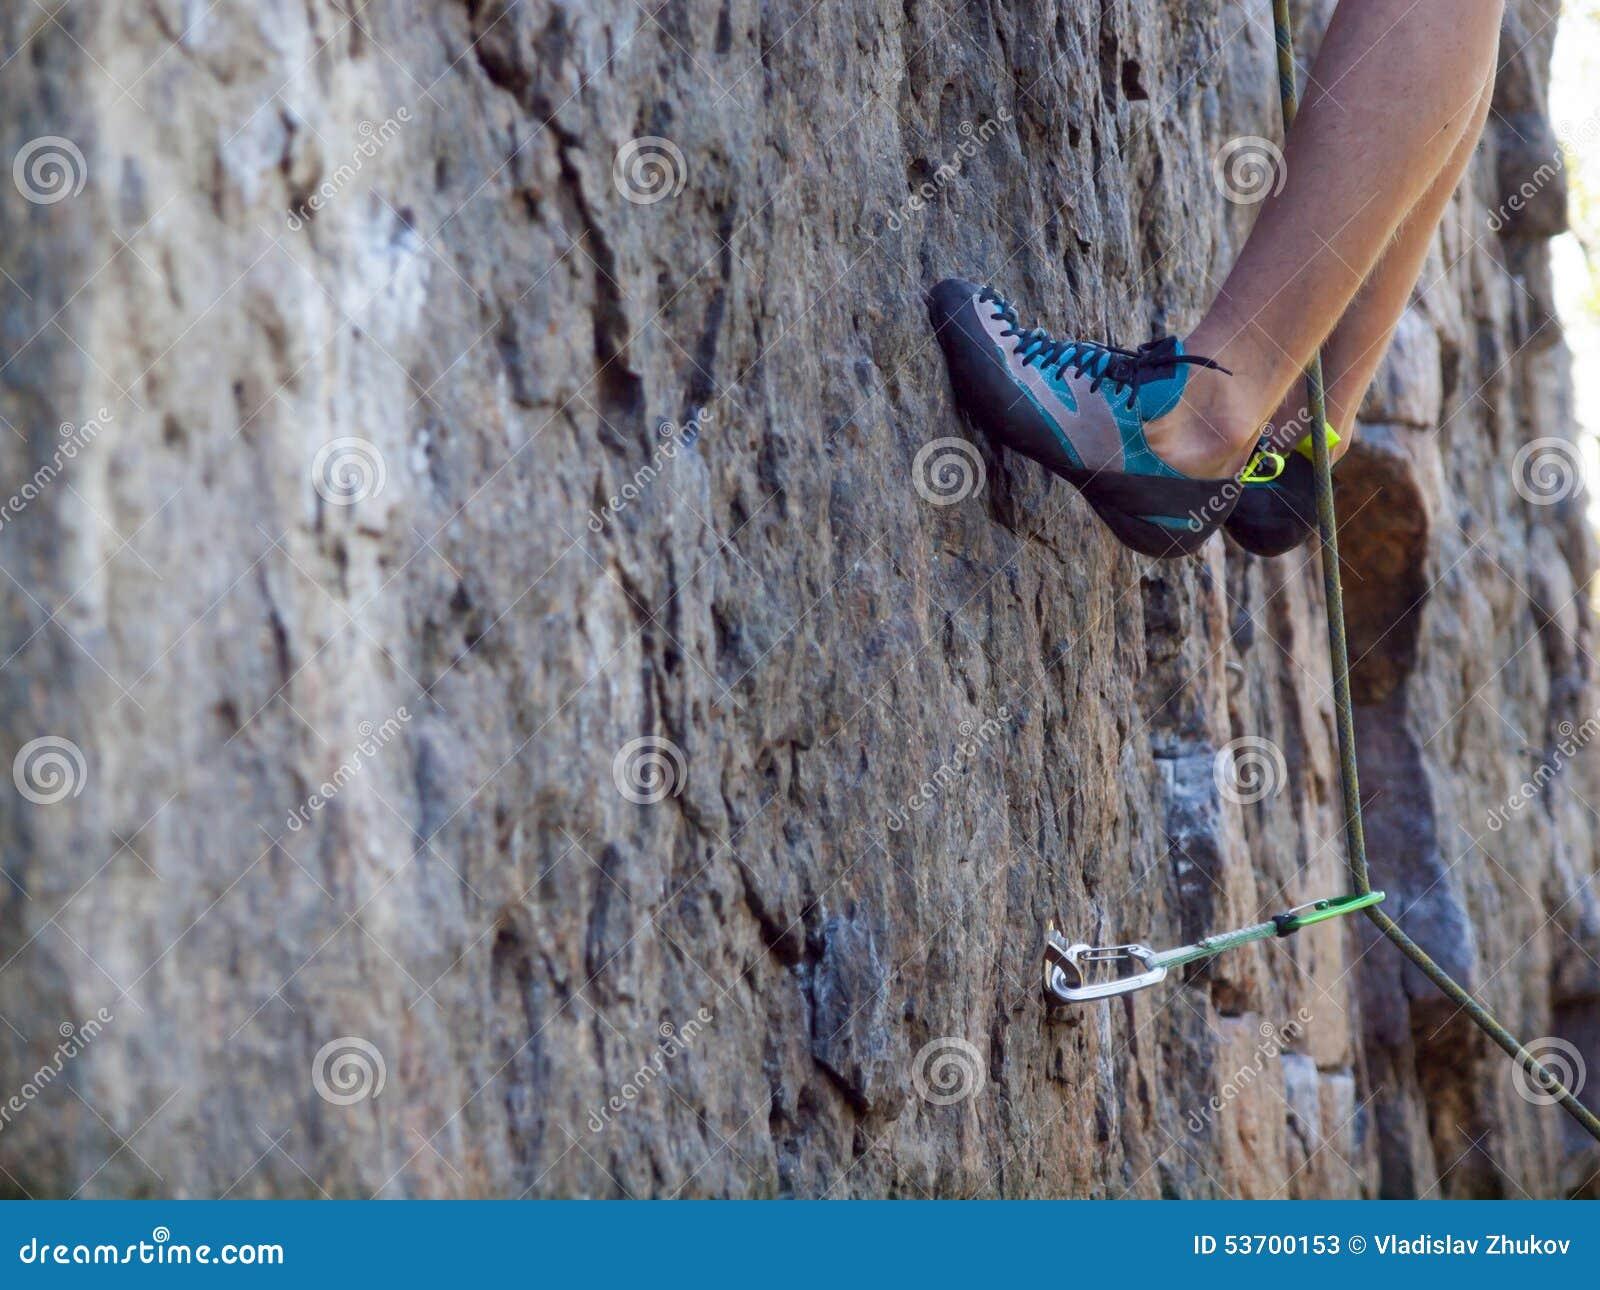 28464b2f616 Παπούτσια για την ορειβασία Στοκ Εικόνα - εικόνα από παρακώλυση ...